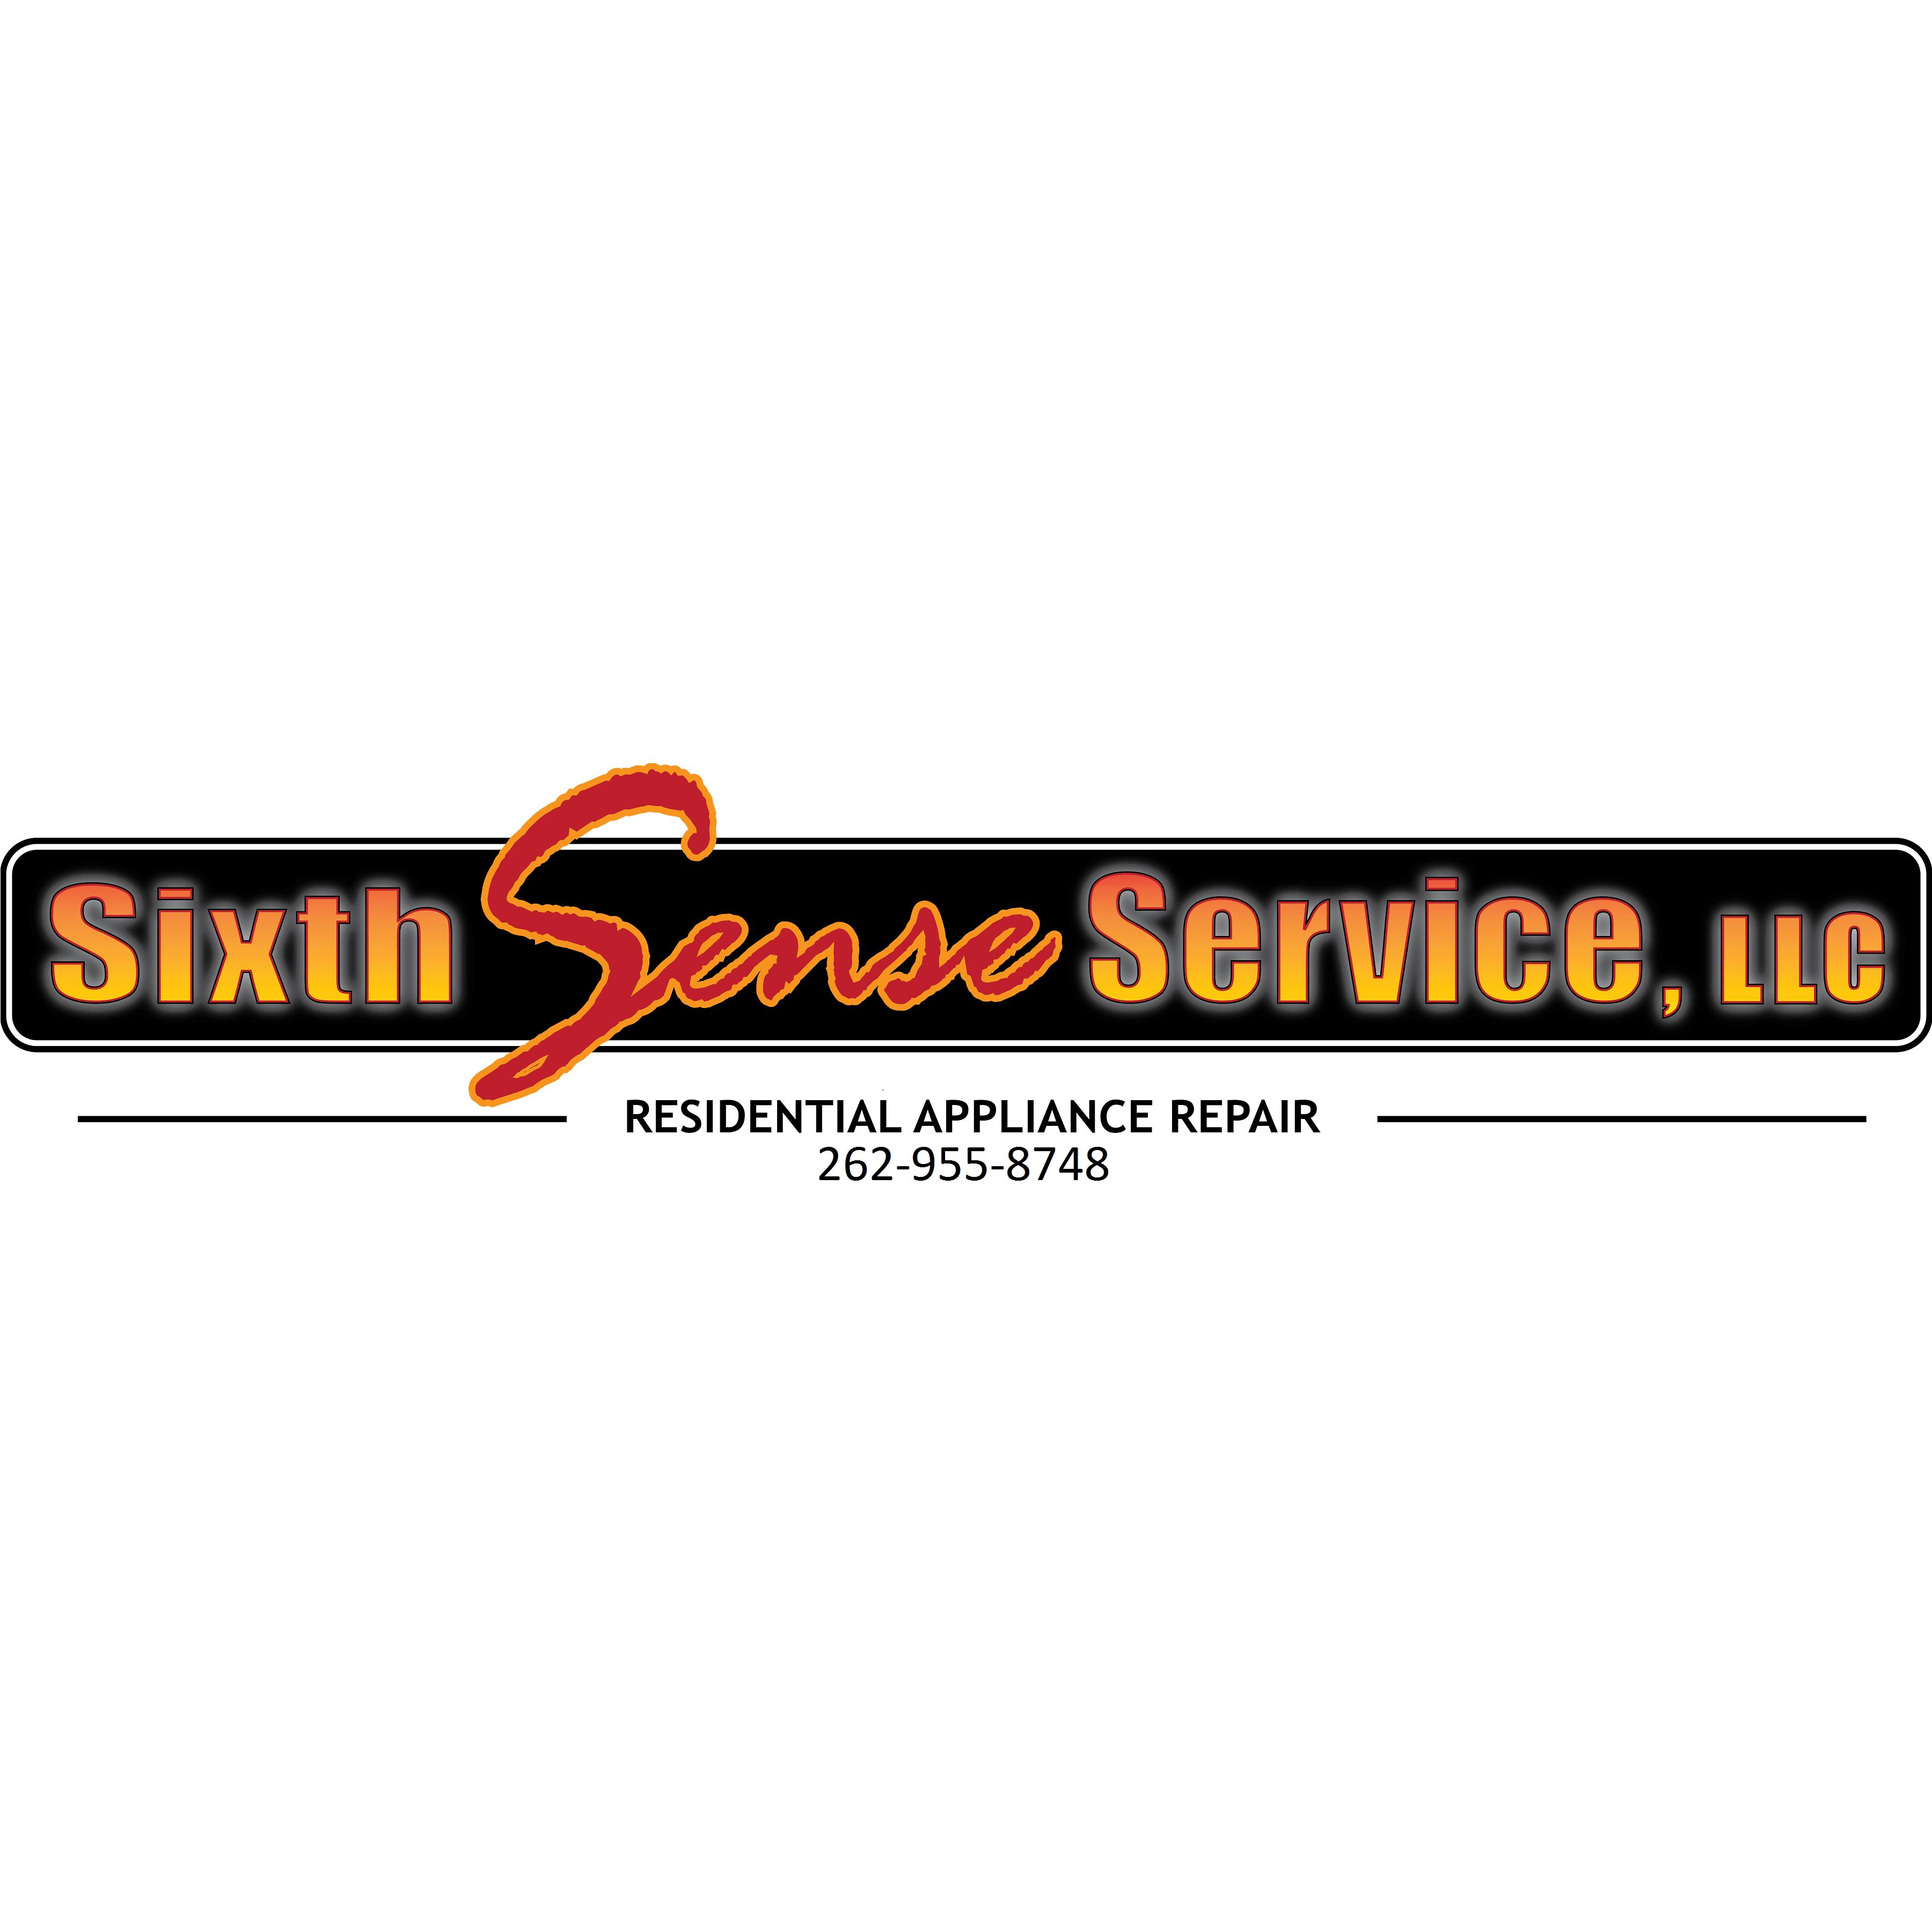 Sixth Sense Service, LLC - Wauwatosa, WI - Appliance Rental & Repair Services